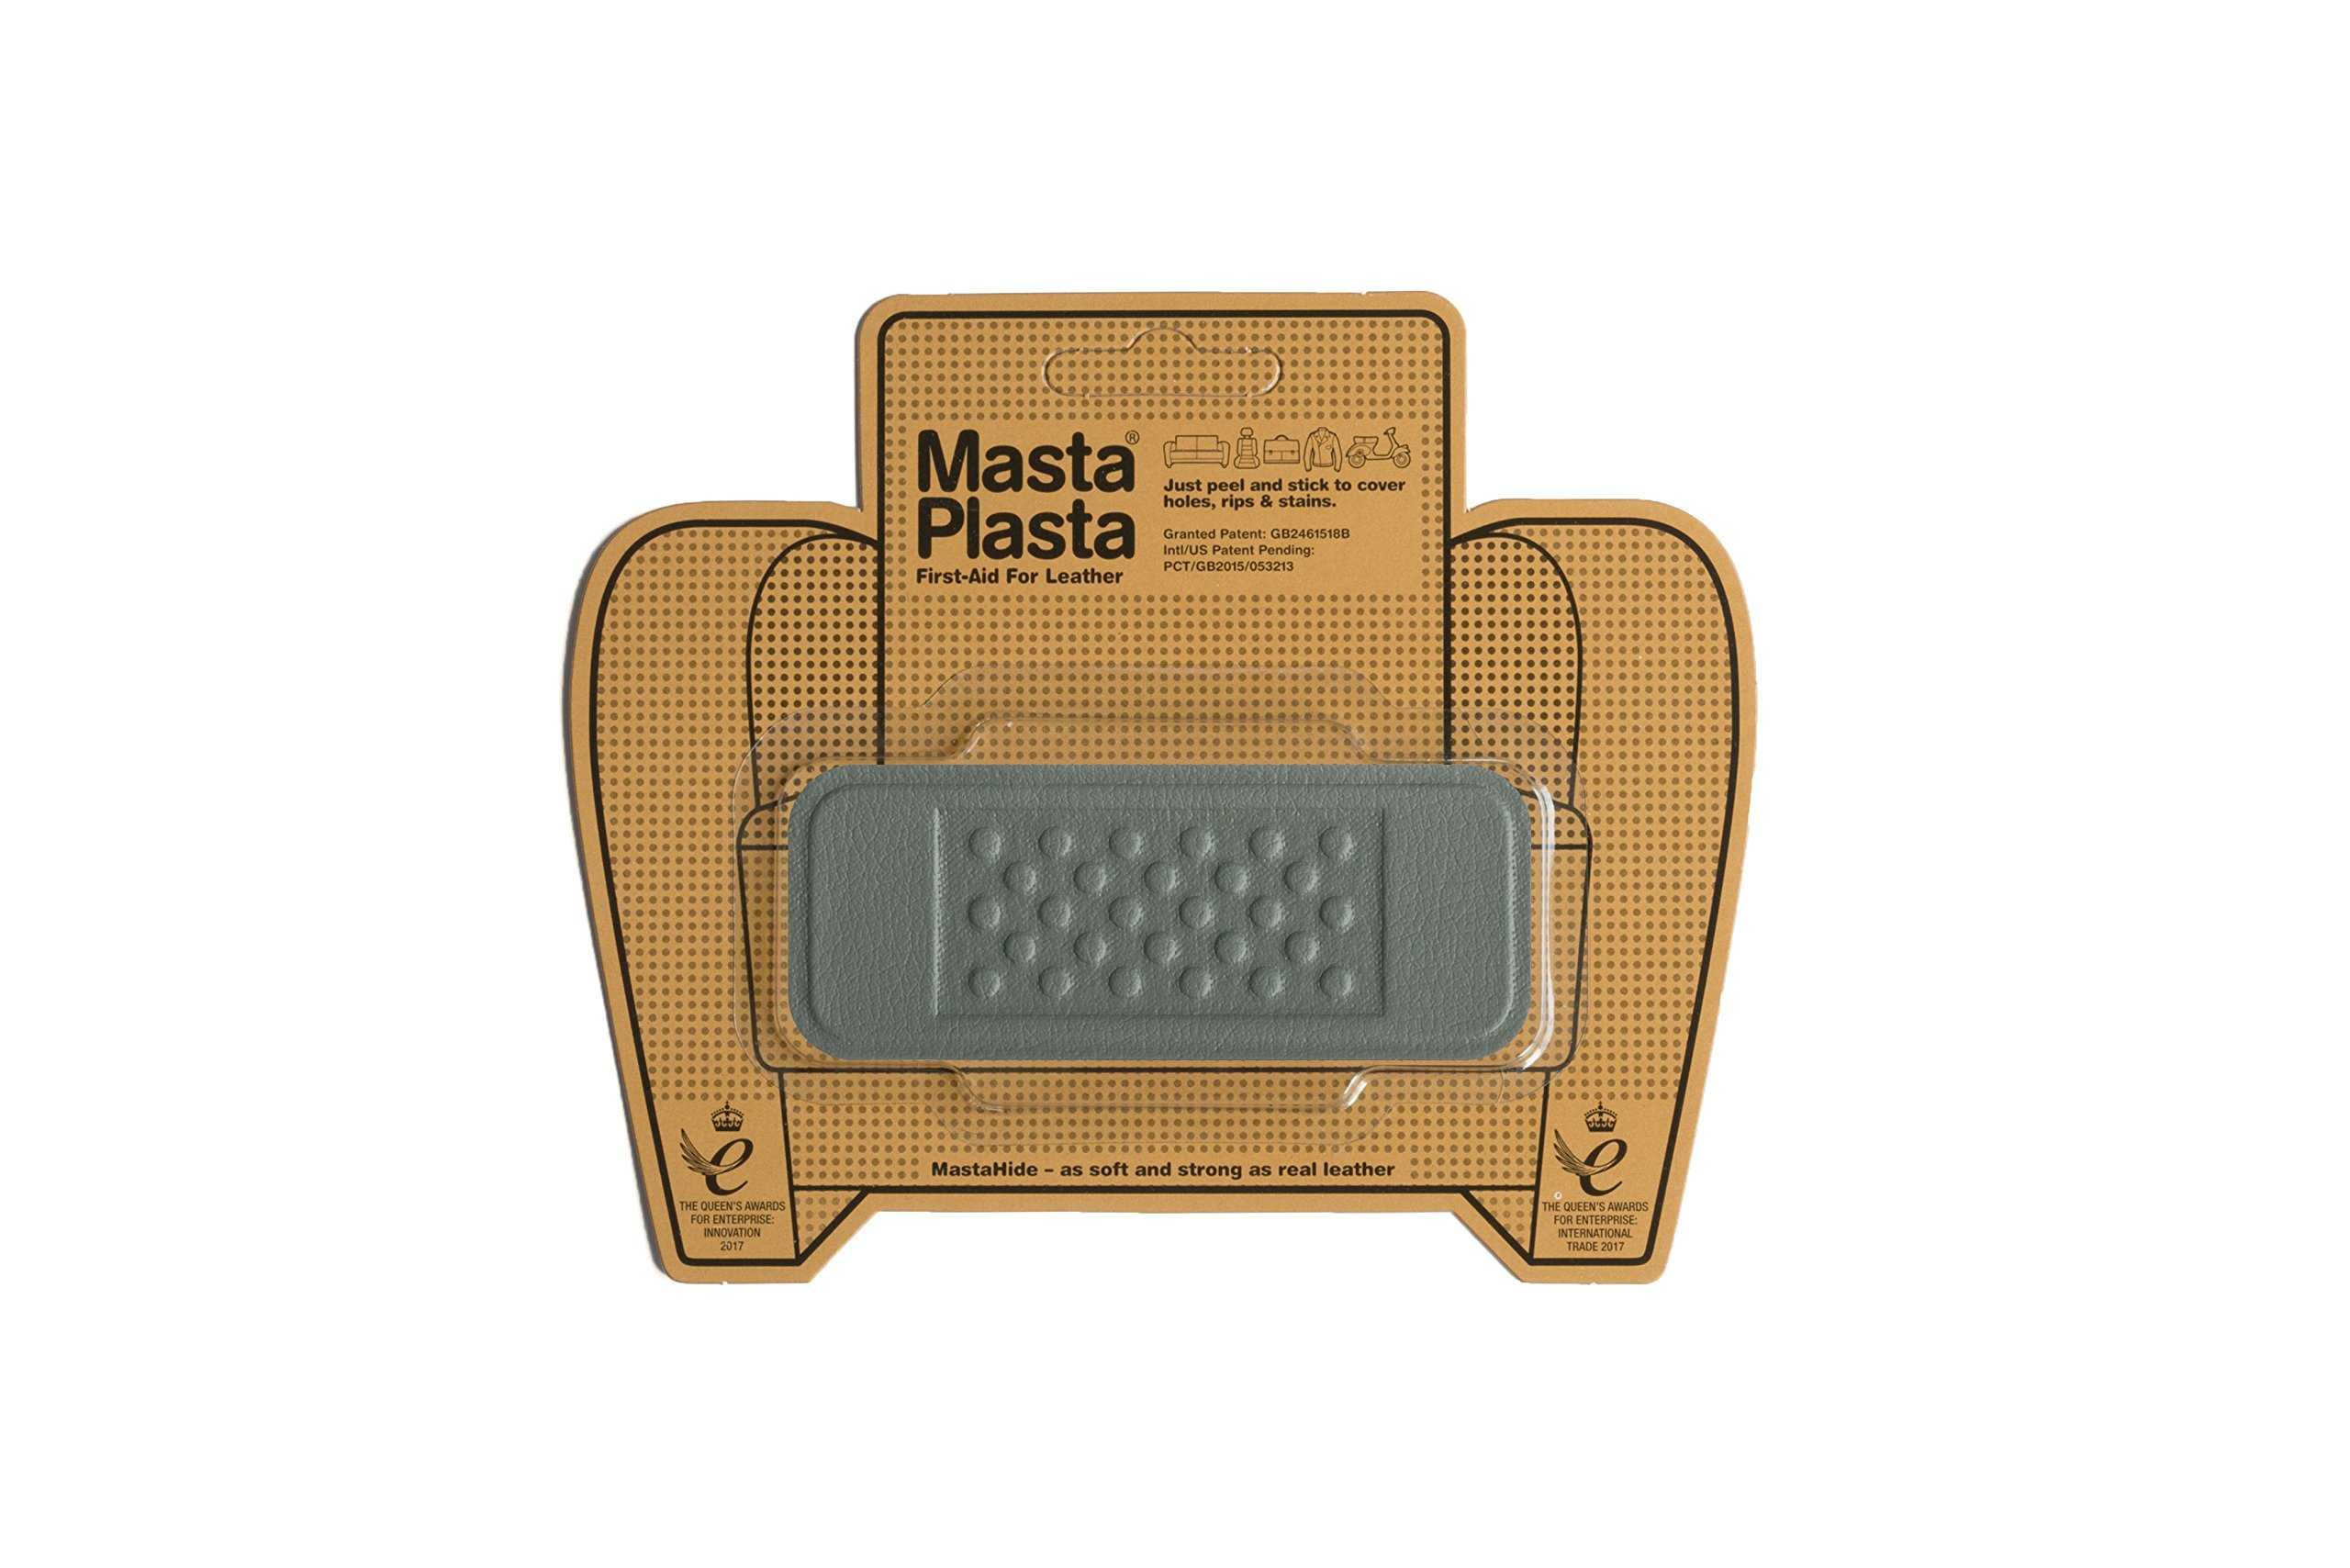 MastaPlasta Self-Adhesive Patch for Leather and Vinyl Repair, Bandage, Gray - 4